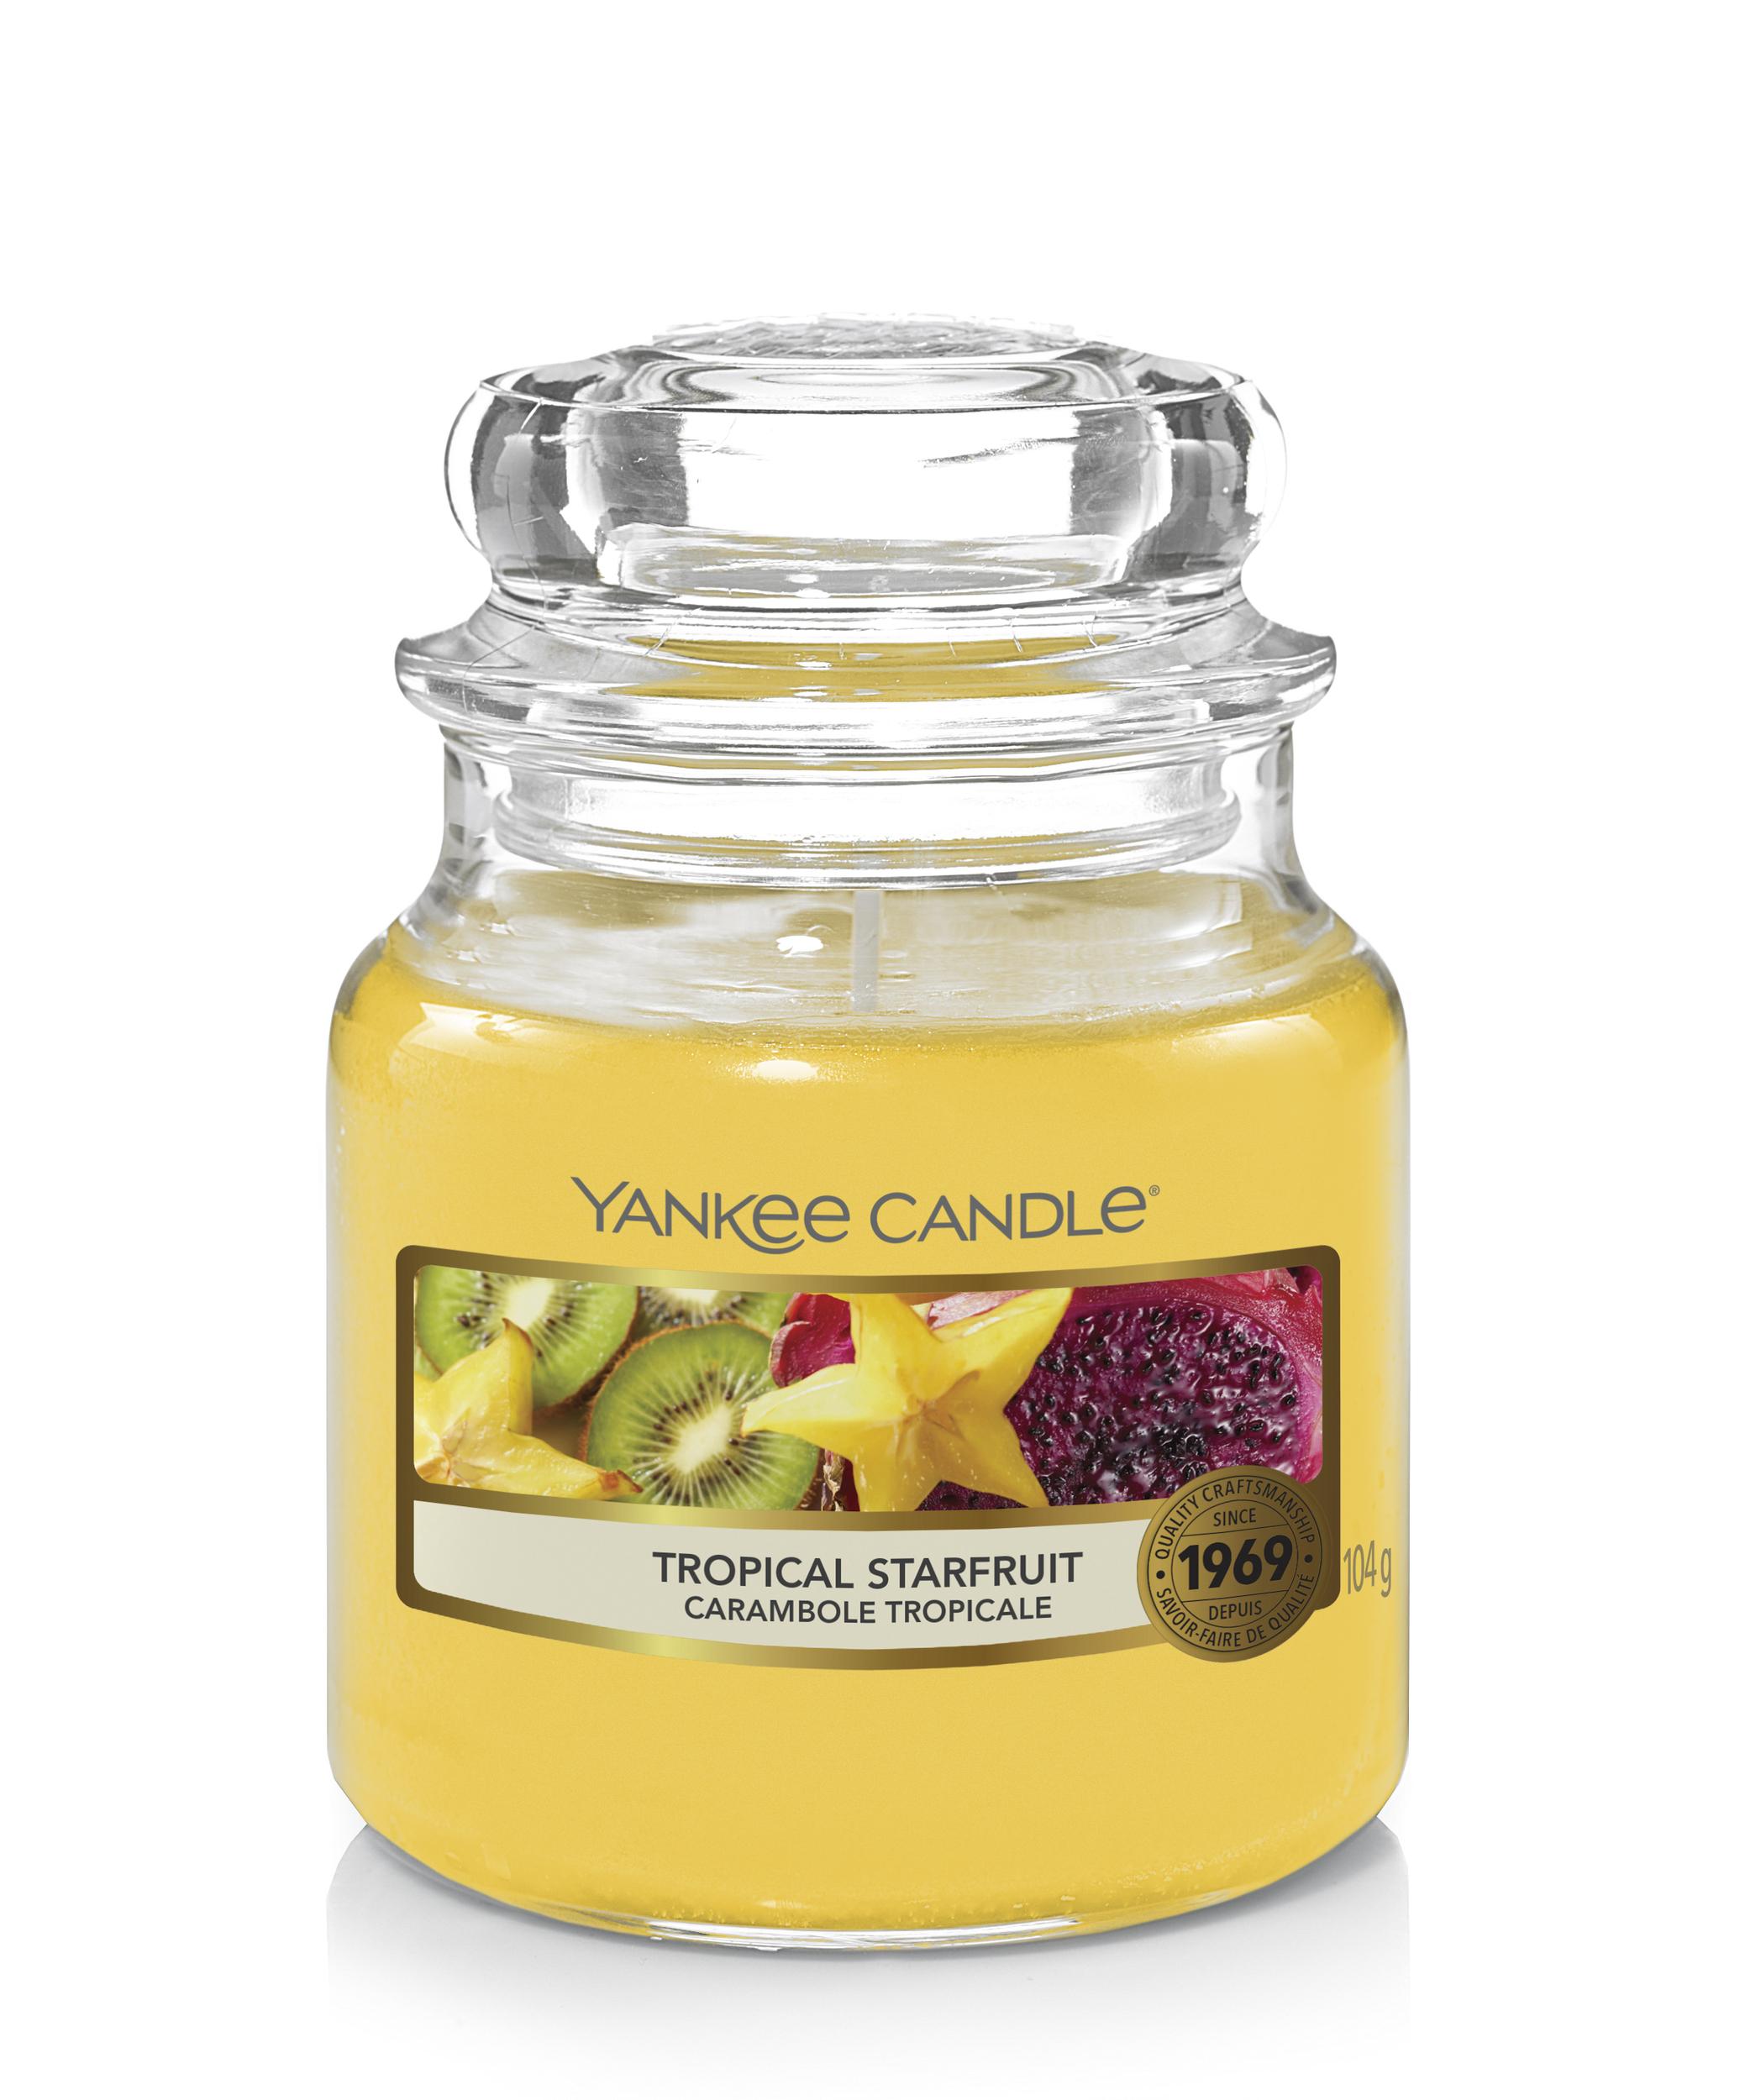 Bougie Tropical Starfruit petite jarre - Yankee Candle